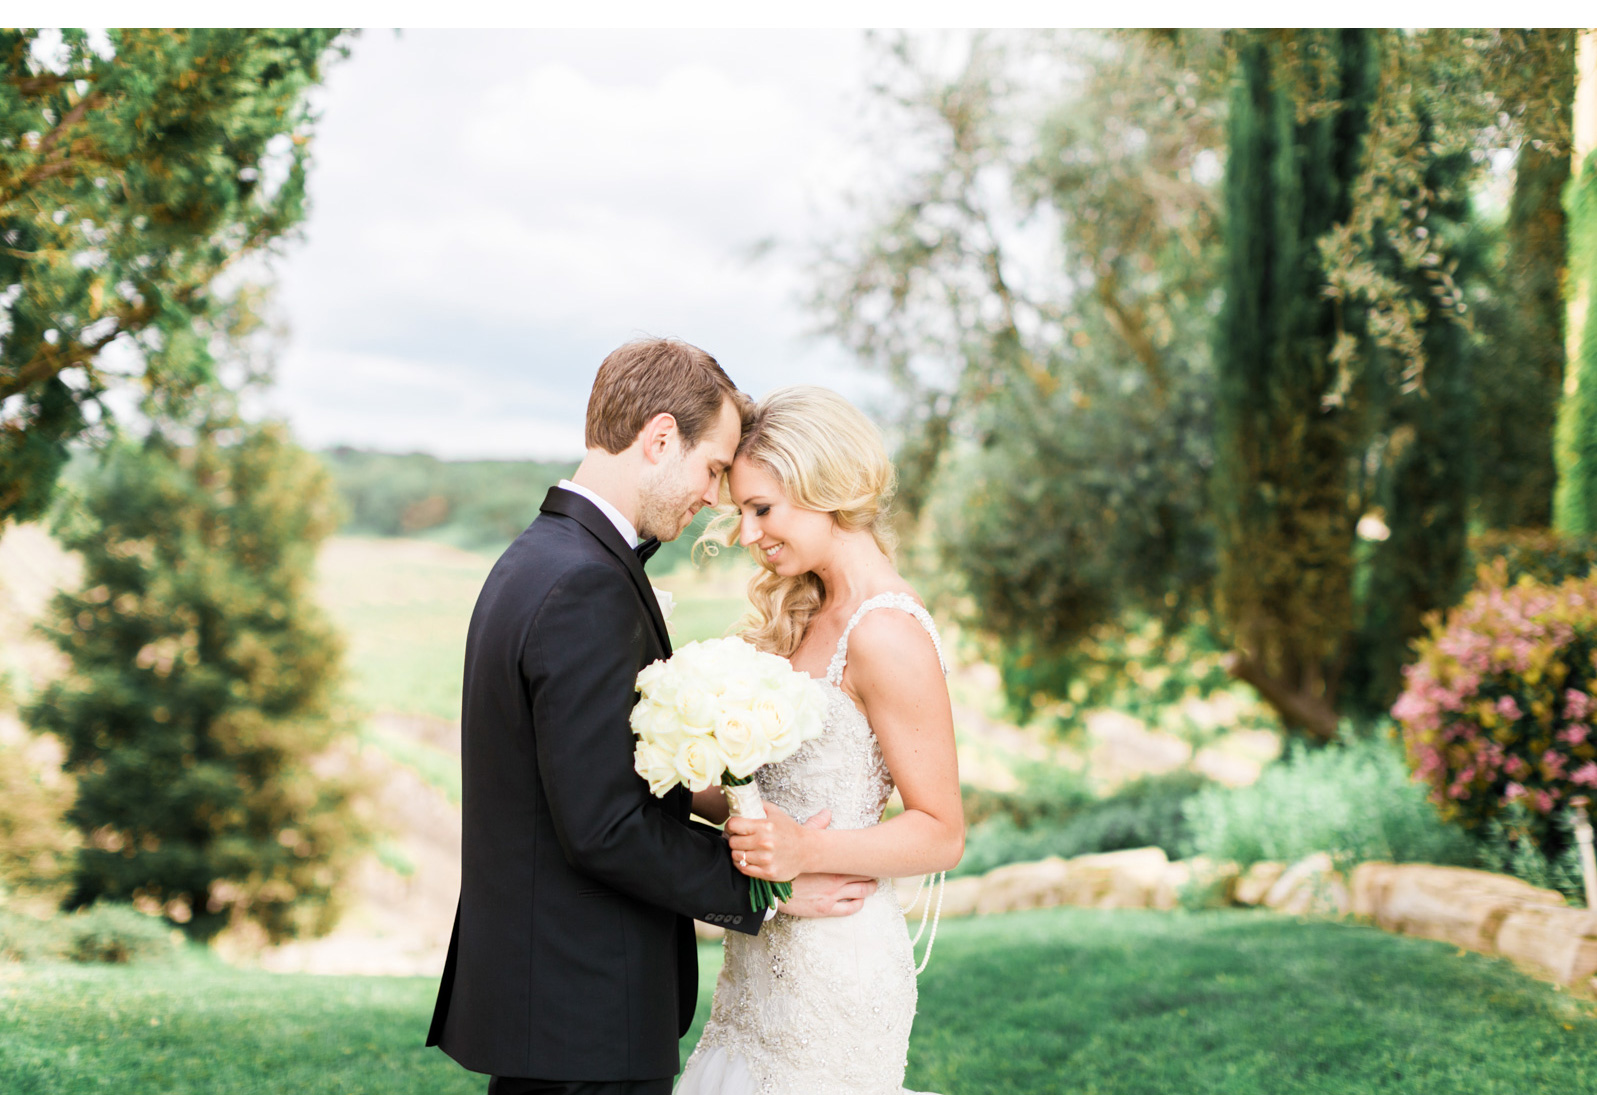 Southern-California-Wedding-Photographer-Natalie-Schutt-Photography_16.jpg